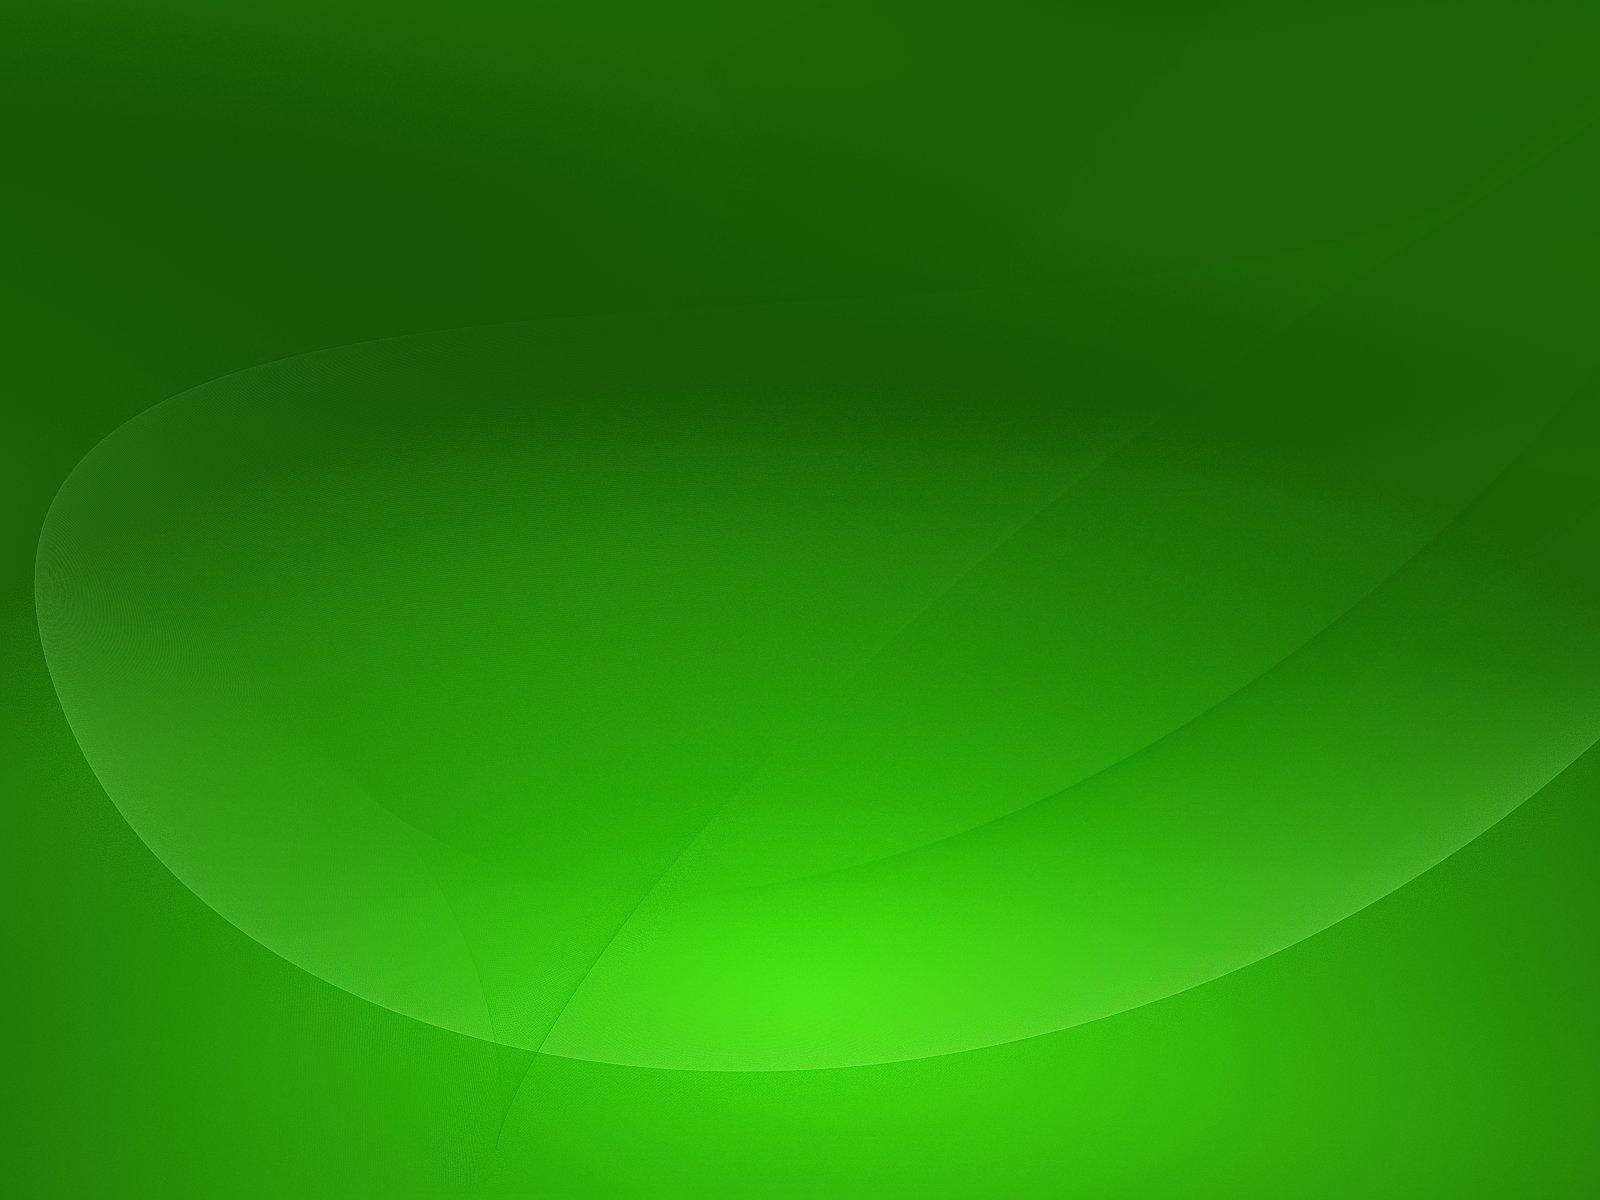 Plain Green Wallpaper Hd Amazing Wallpaper Hd Library